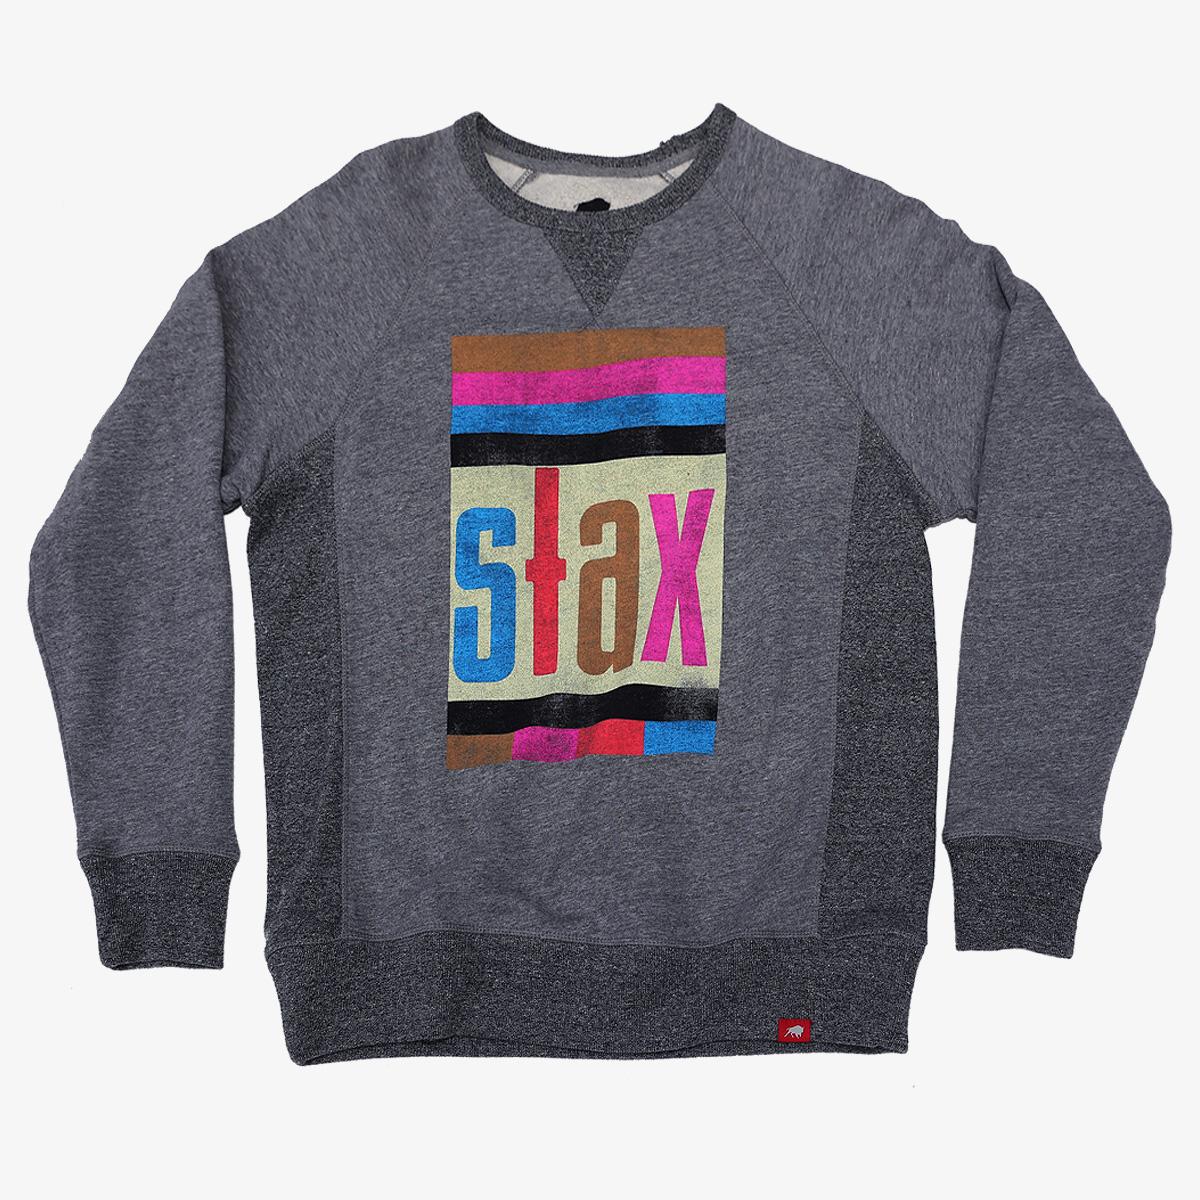 Multi-Colored Stax Logo Sweatshirt